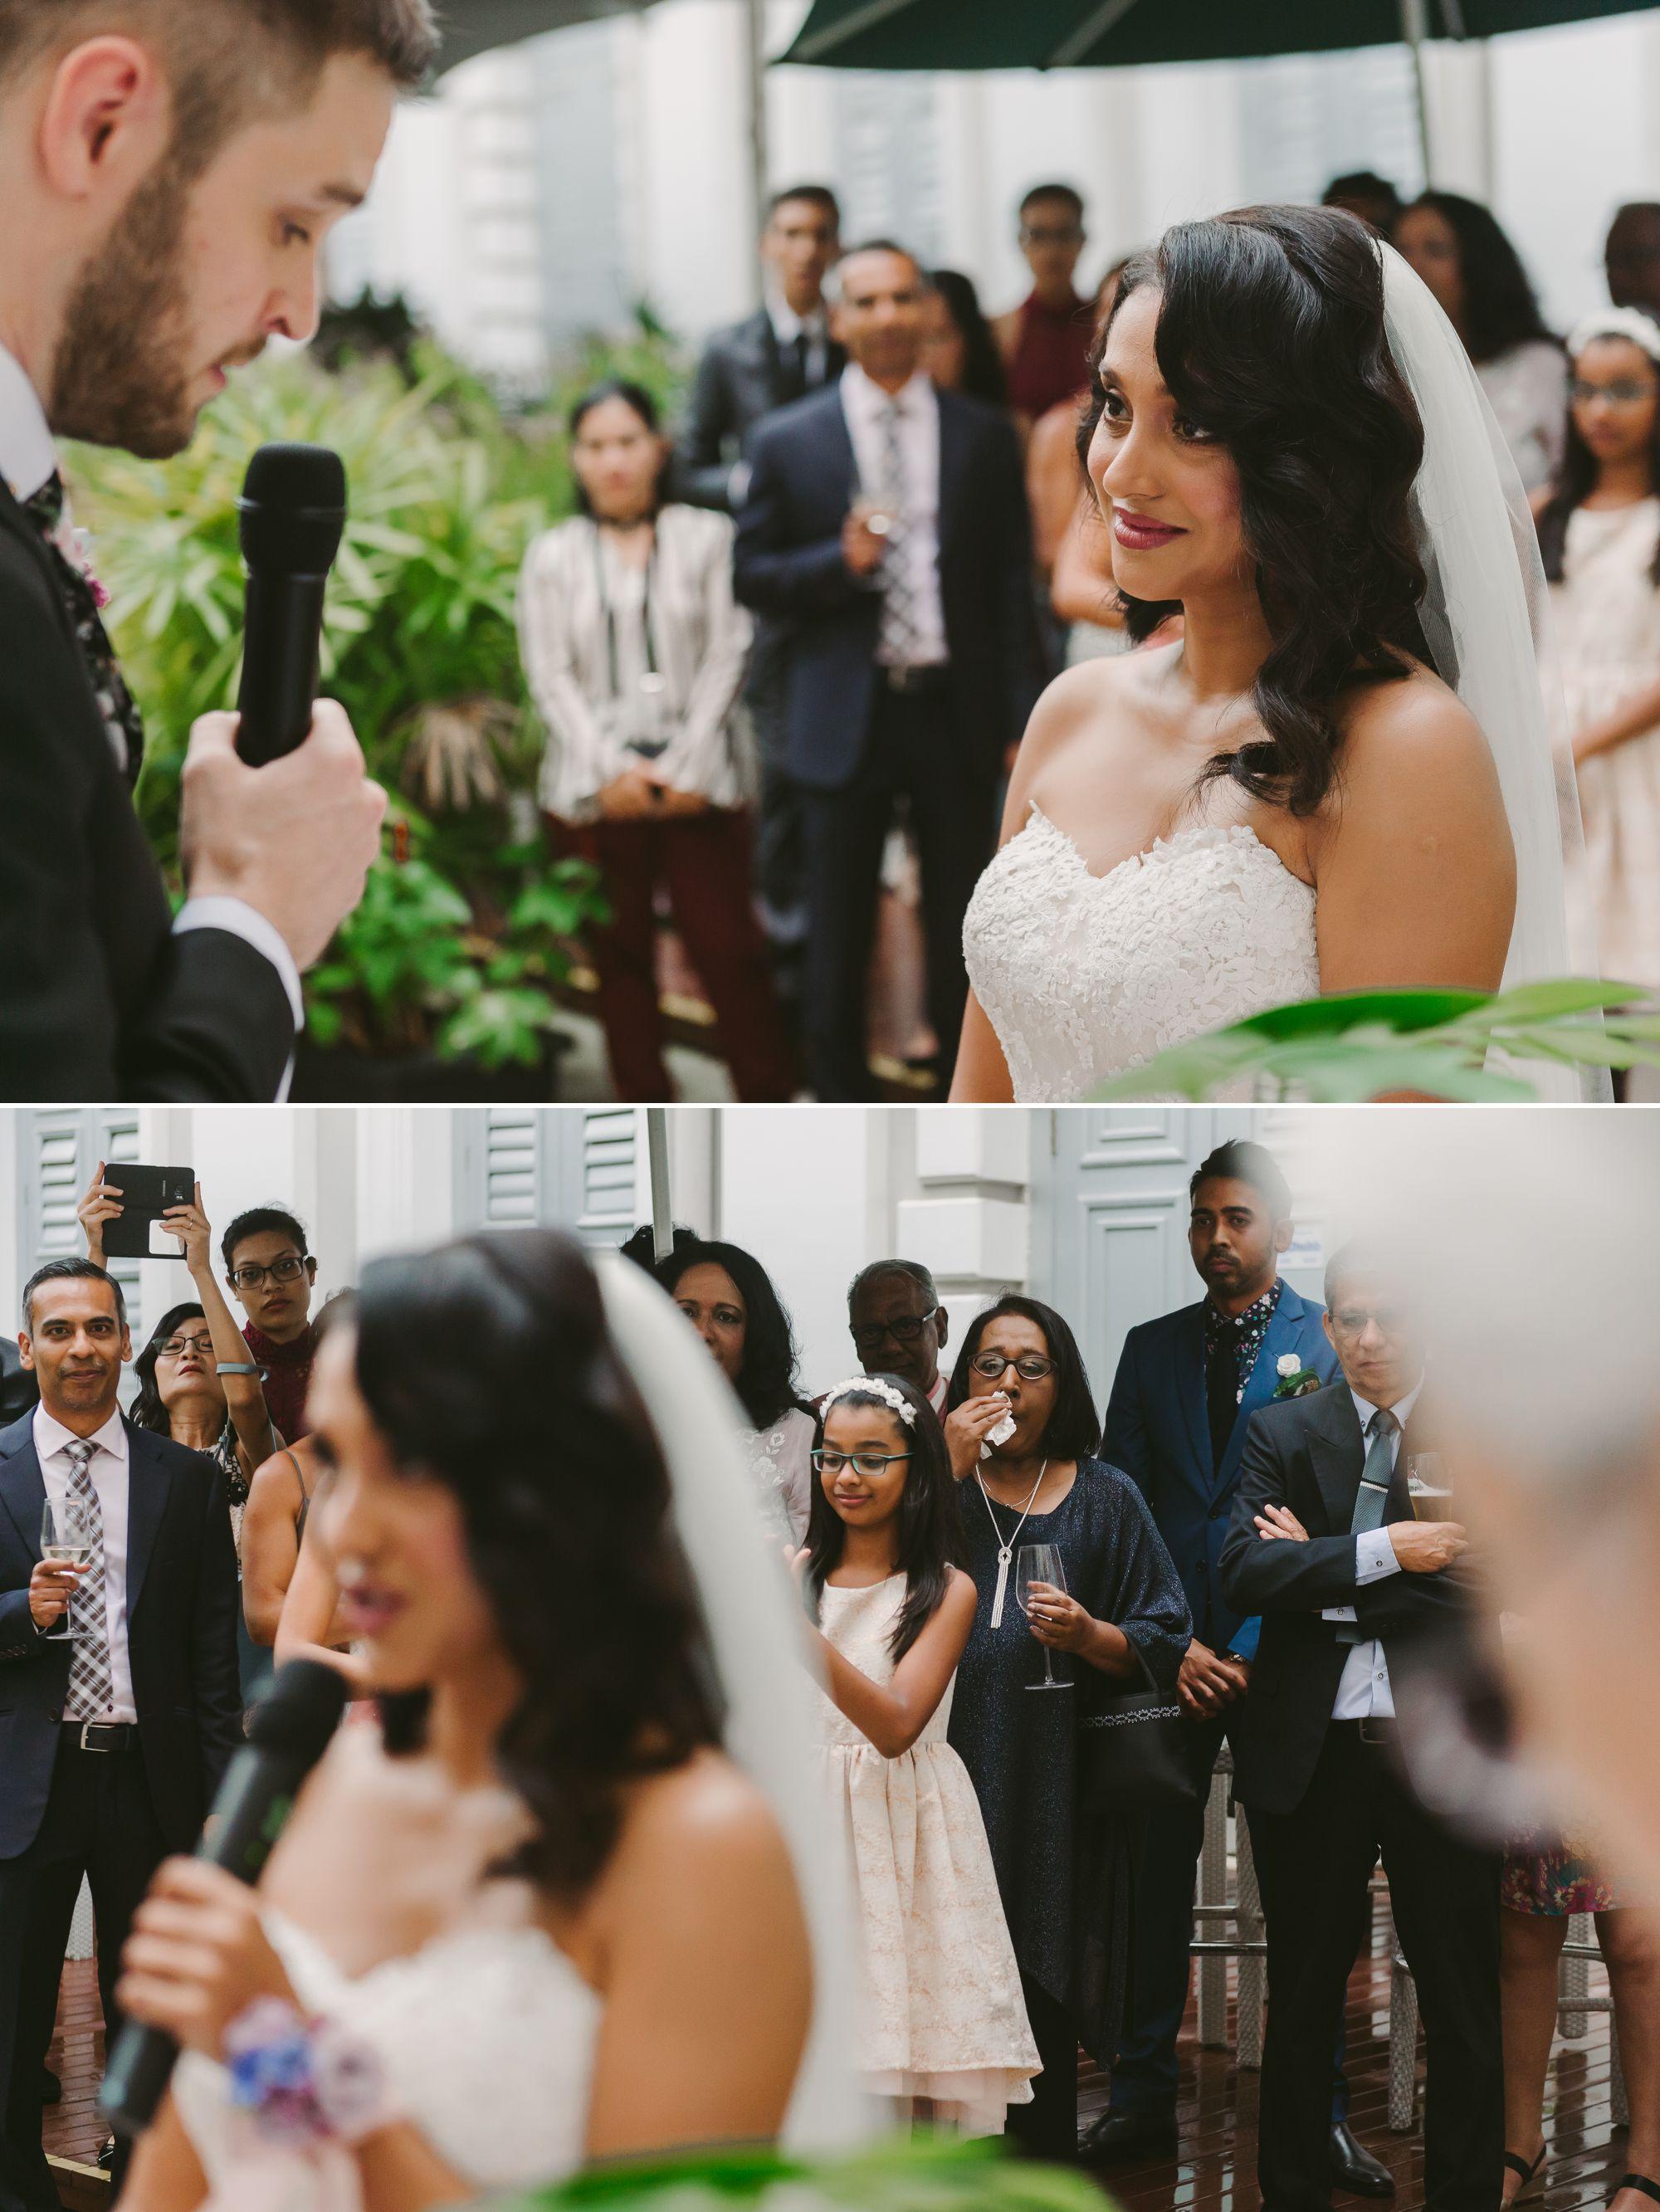 wedding_day_photography_ 18.jpg